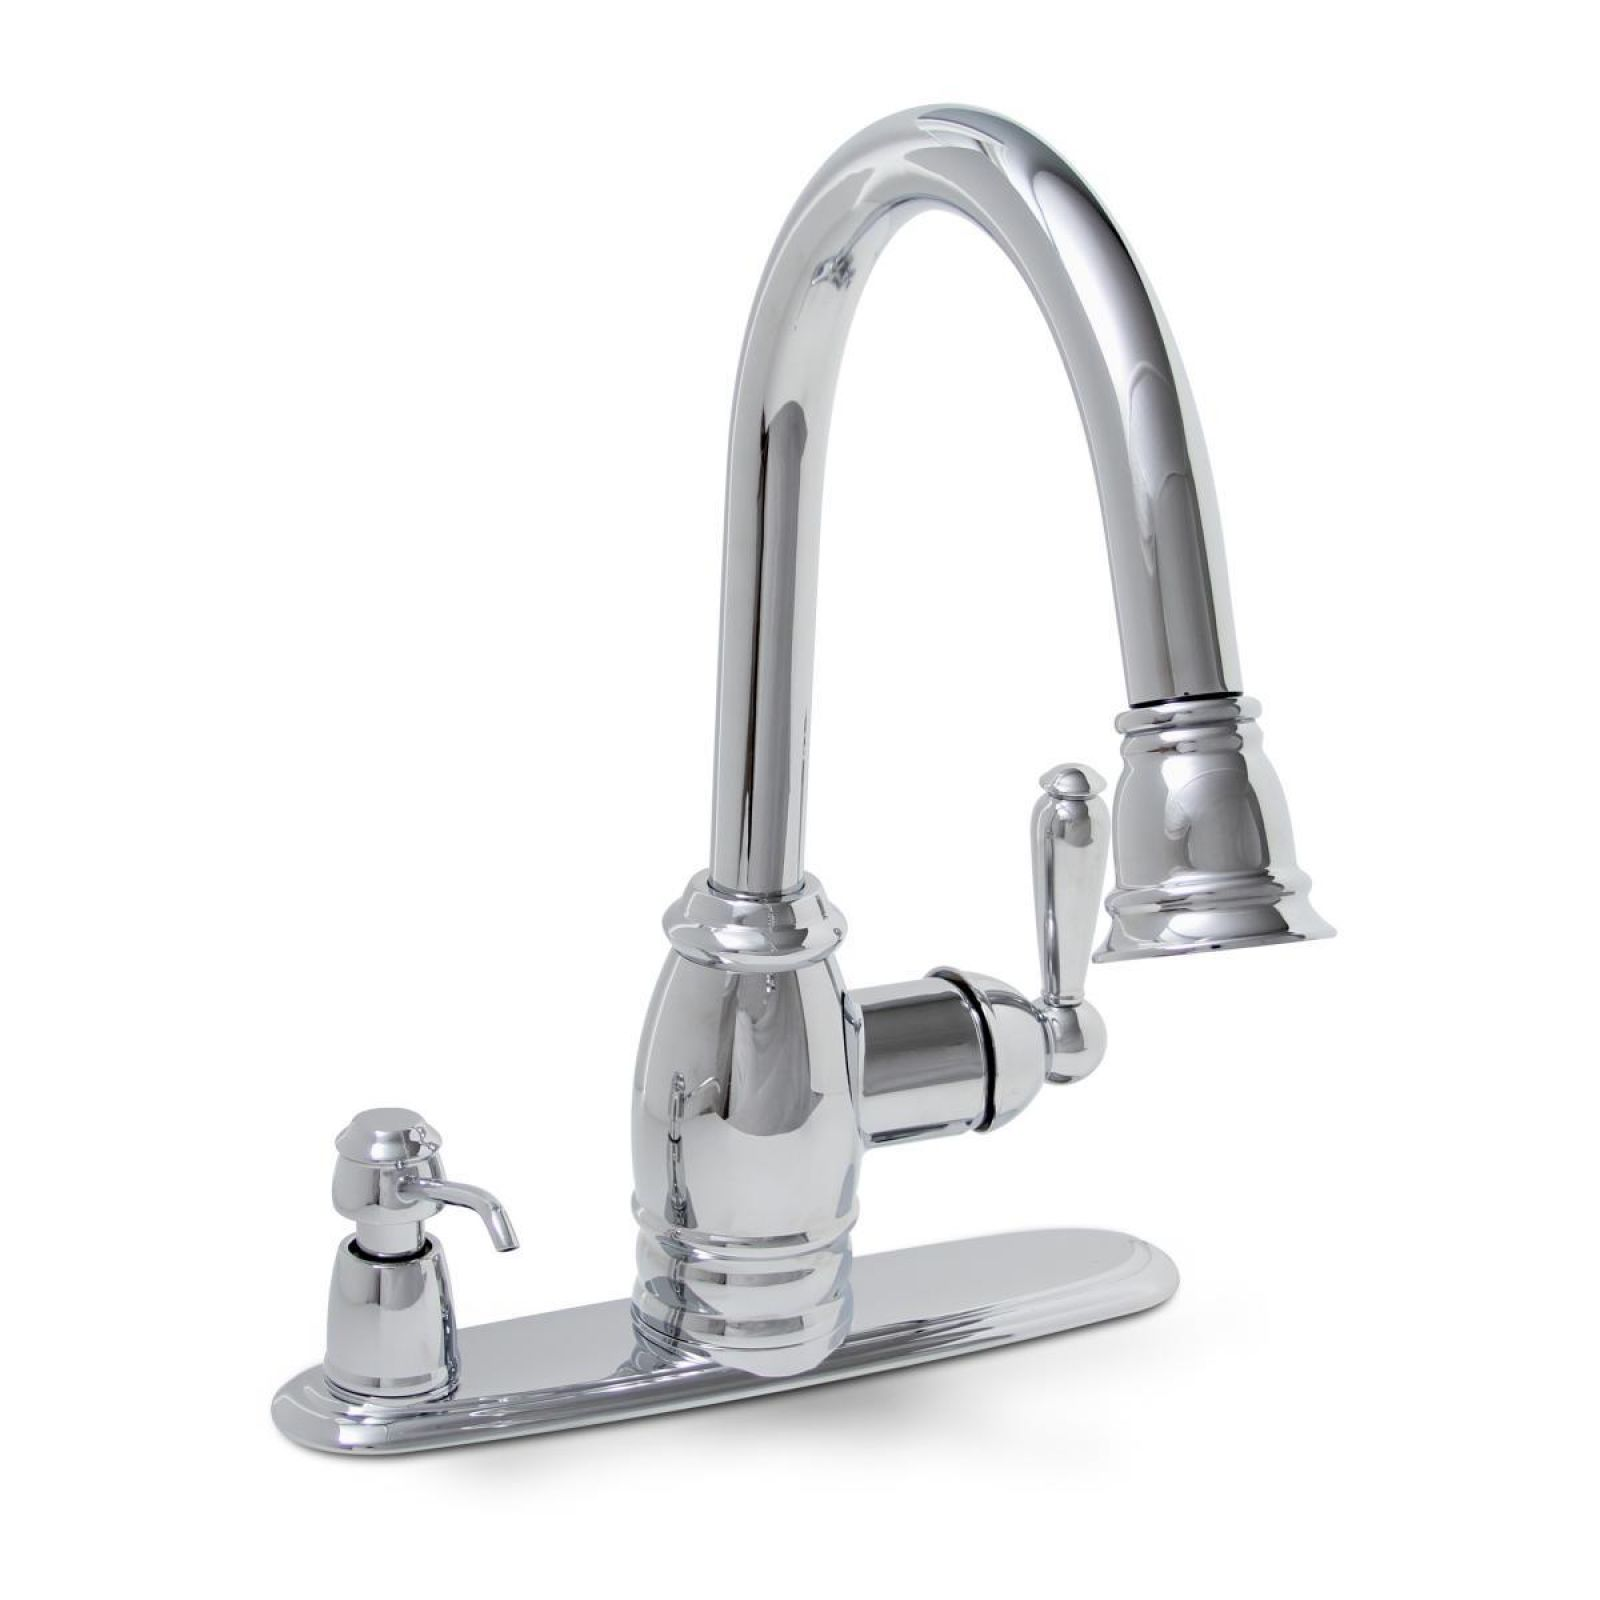 Sonoma Pull Down Kitchen Faucet | Delta Plumbing